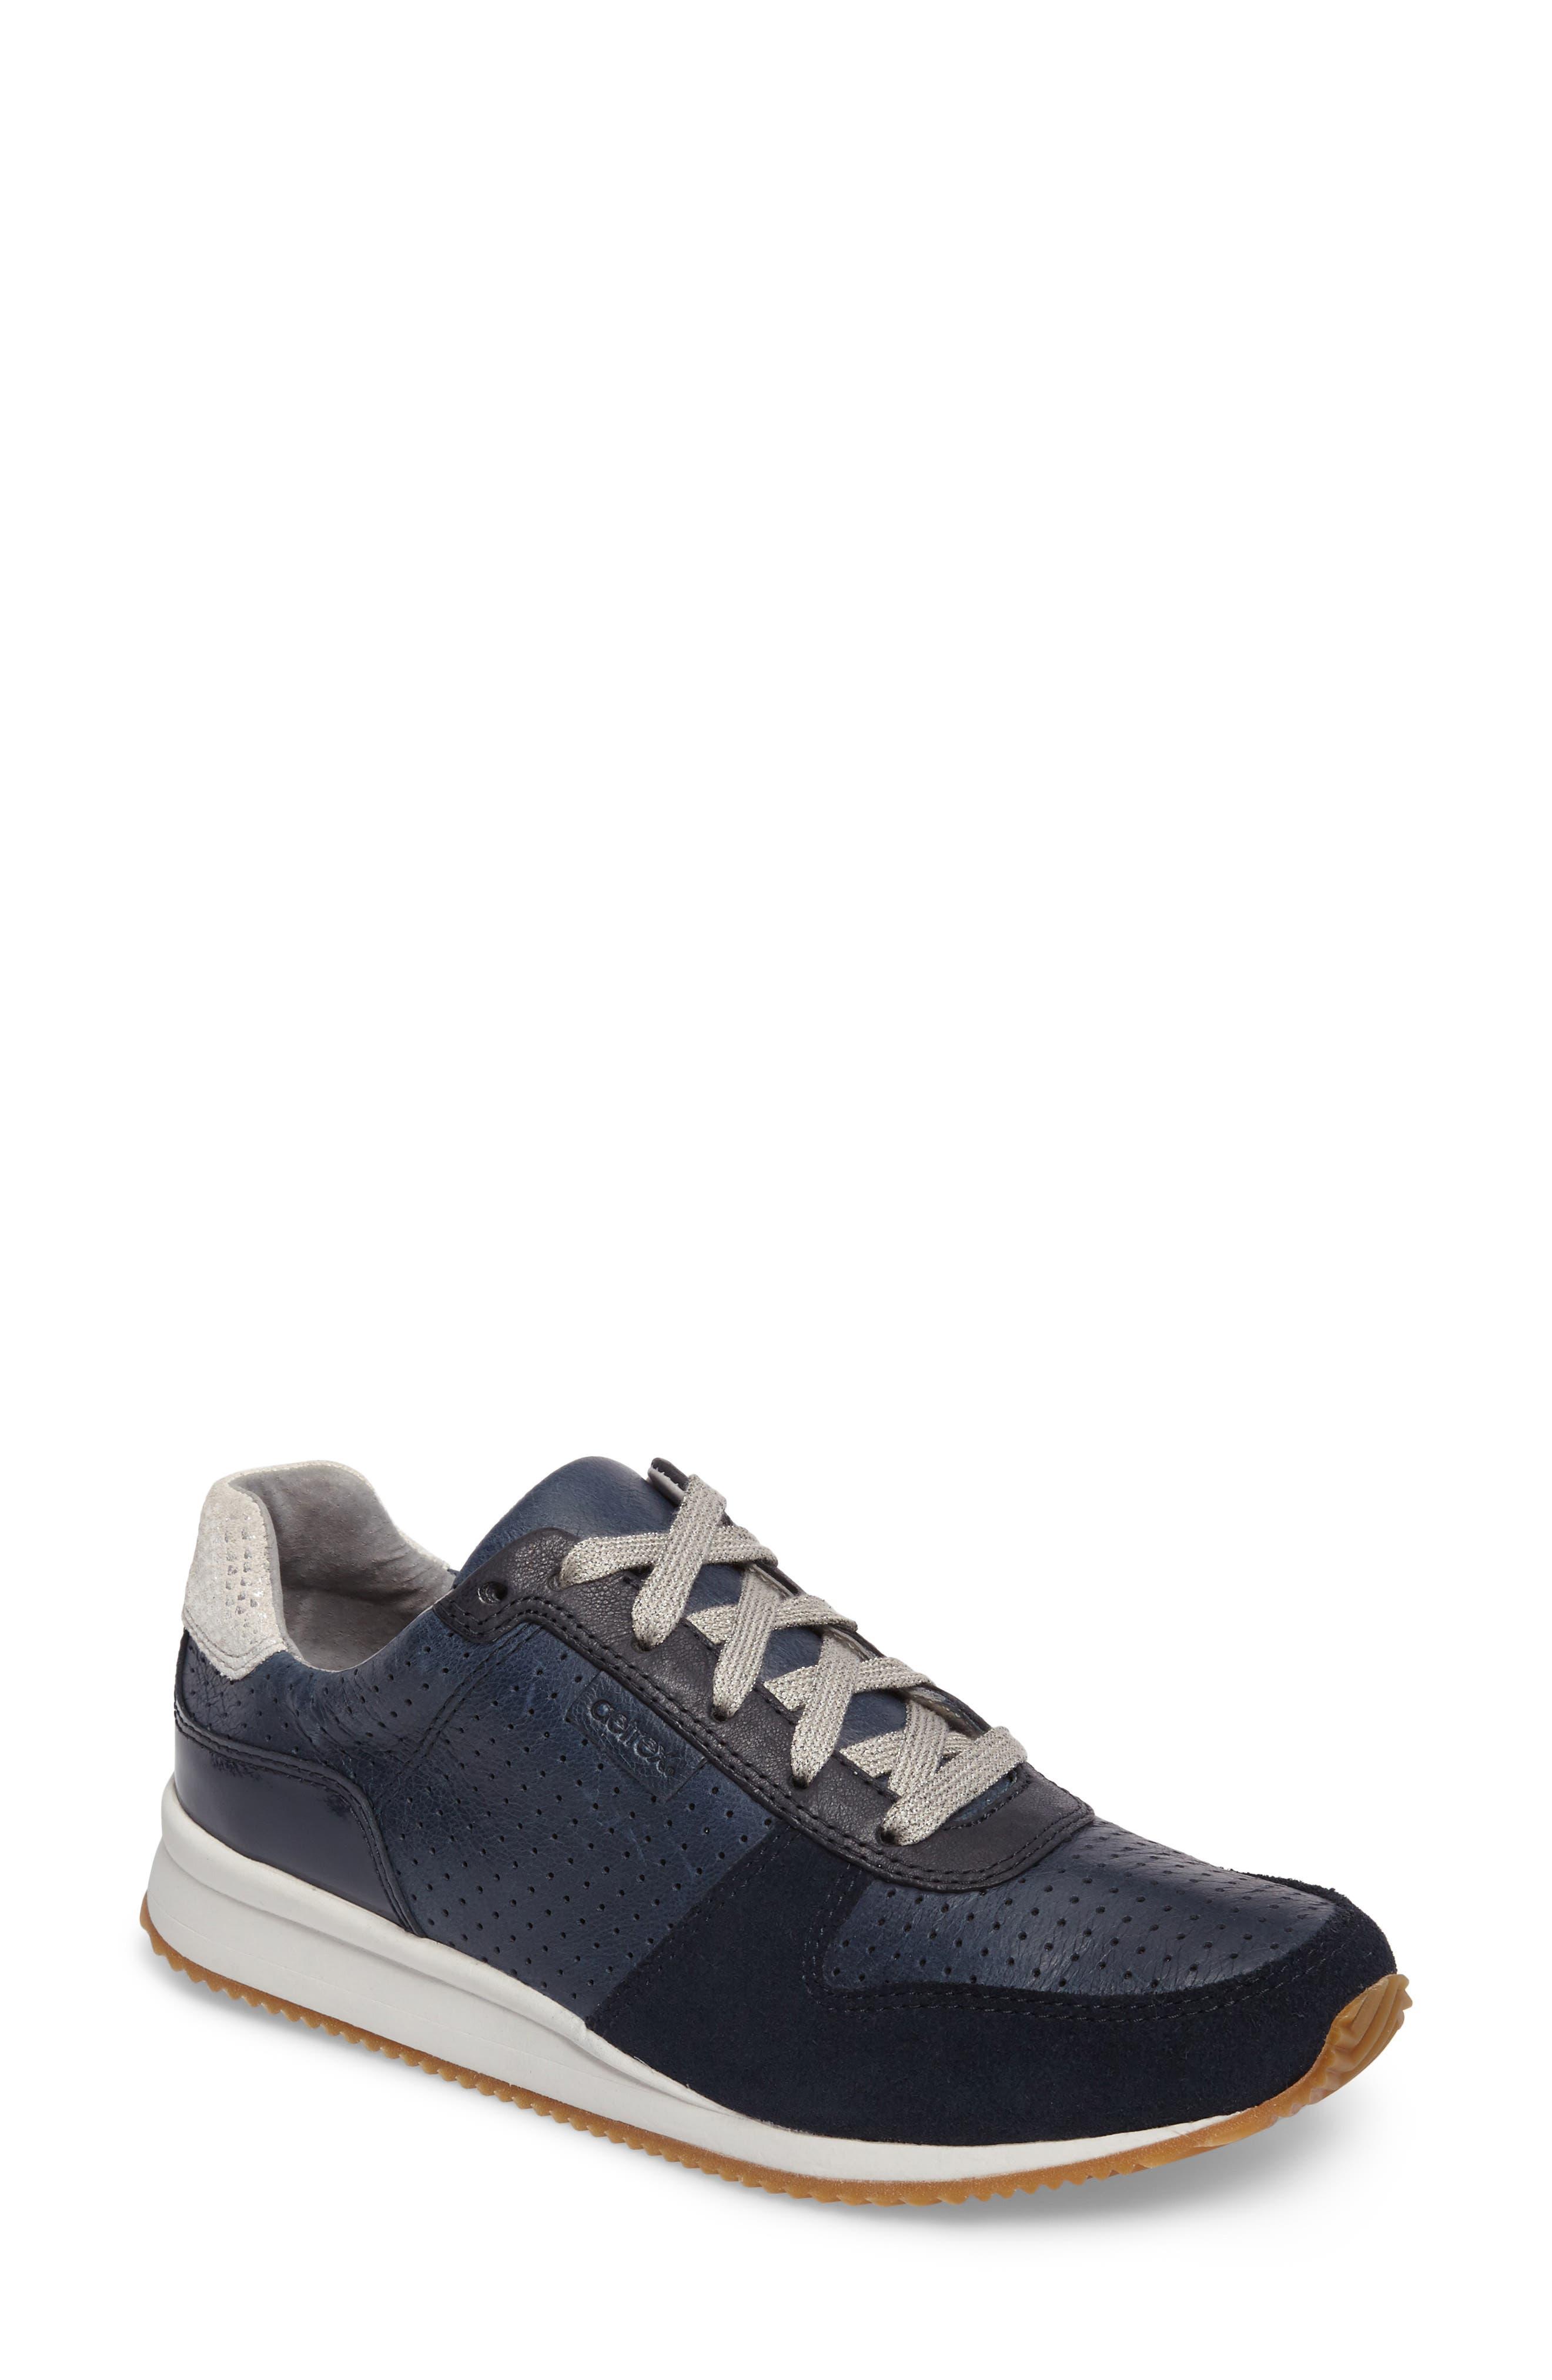 Aetrex Daphne Sneaker, Blue